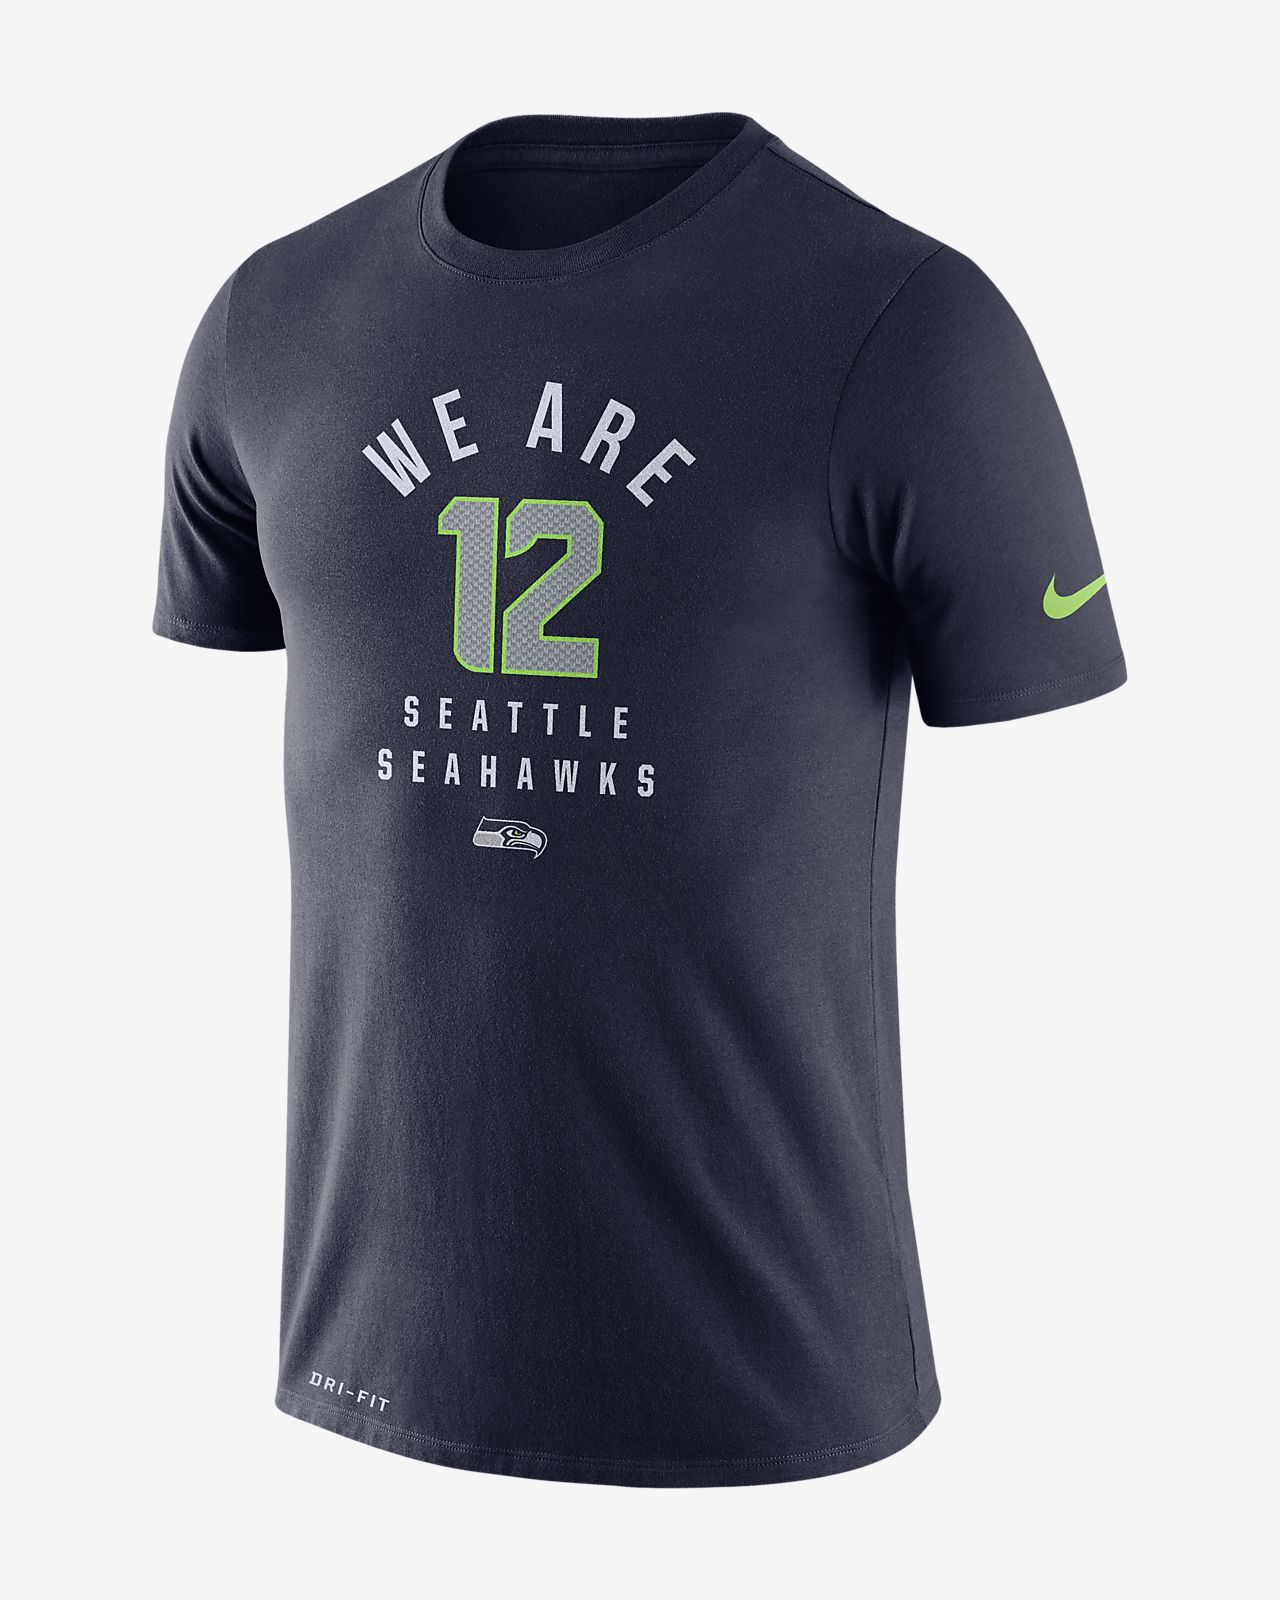 Nike Dri-FIT Local (NFL Seahawks) Men's T-Shirt